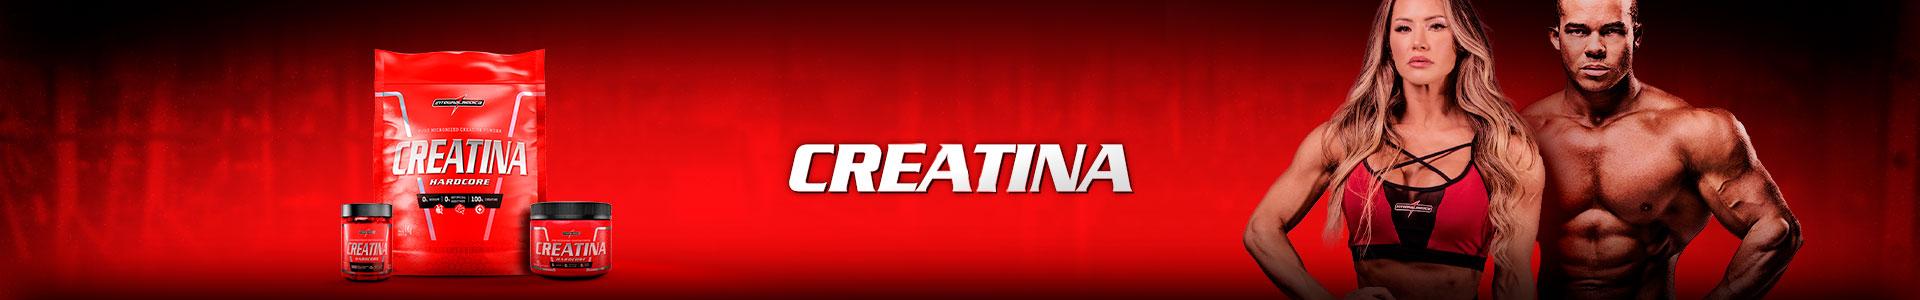 Banner - Creatina - Desktop